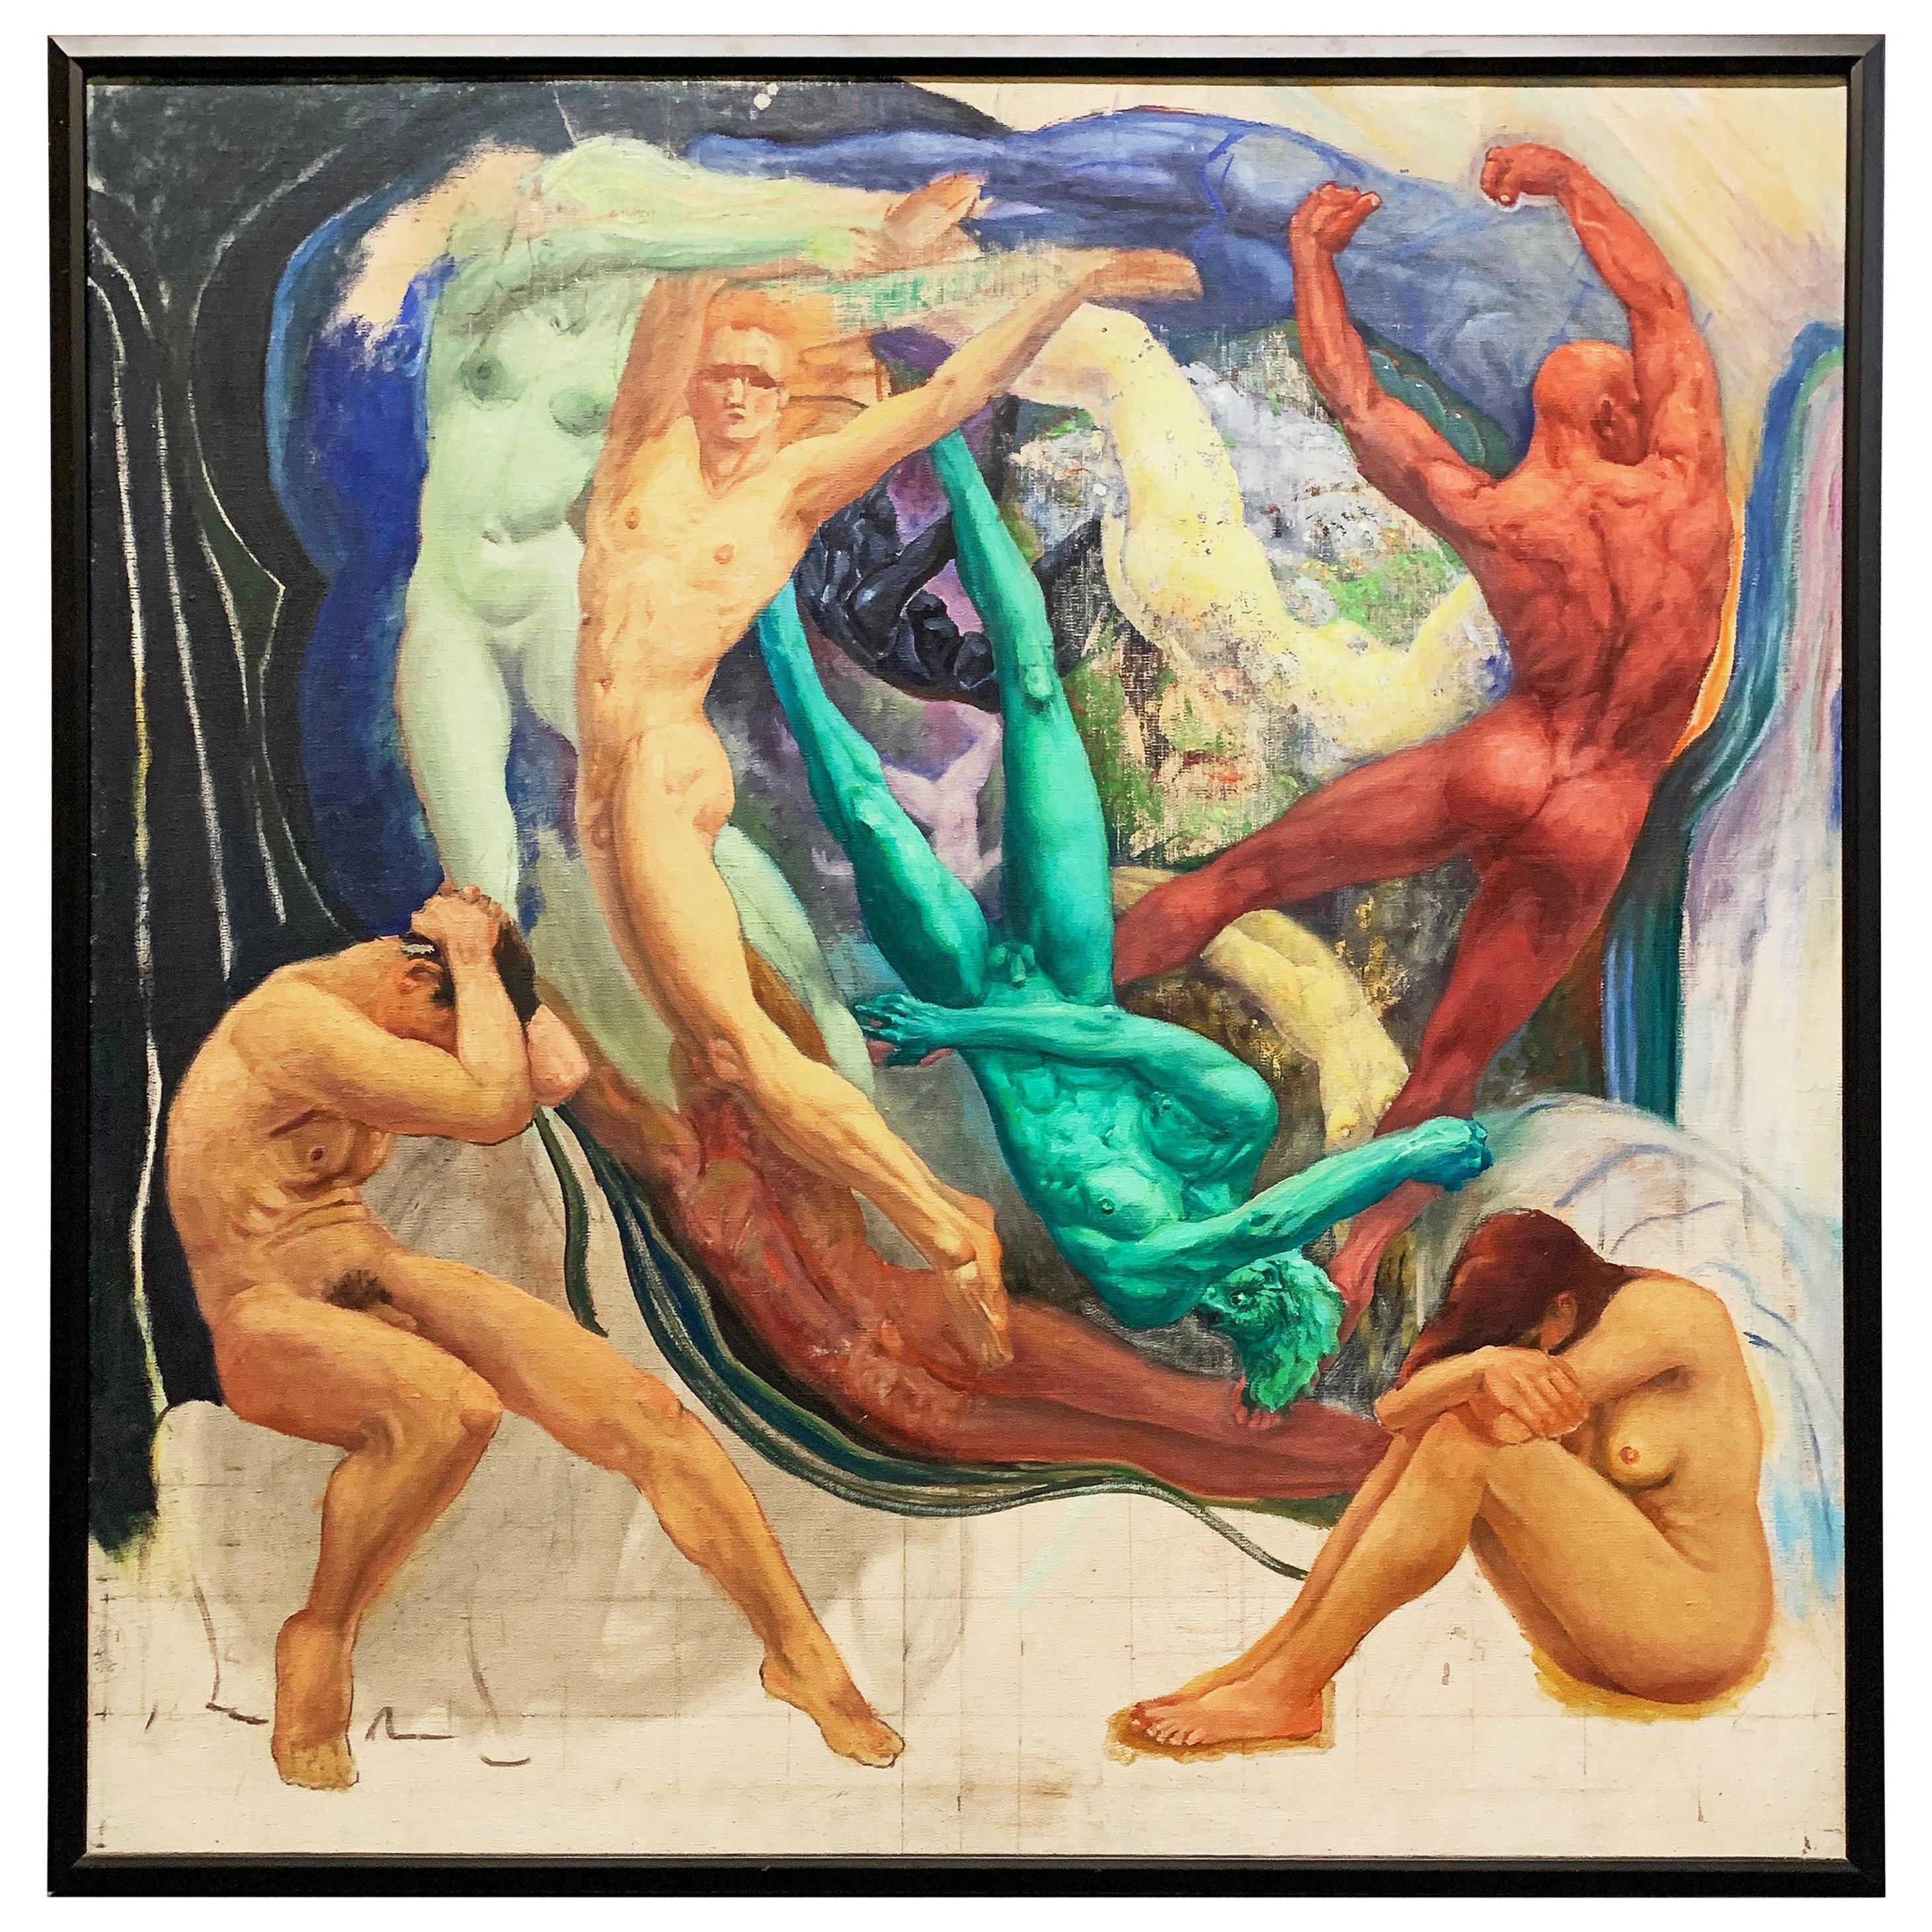 """Ten Nudes Dancing,"" Large Art Deco-Surrealist Painting by Bond, 1940s"